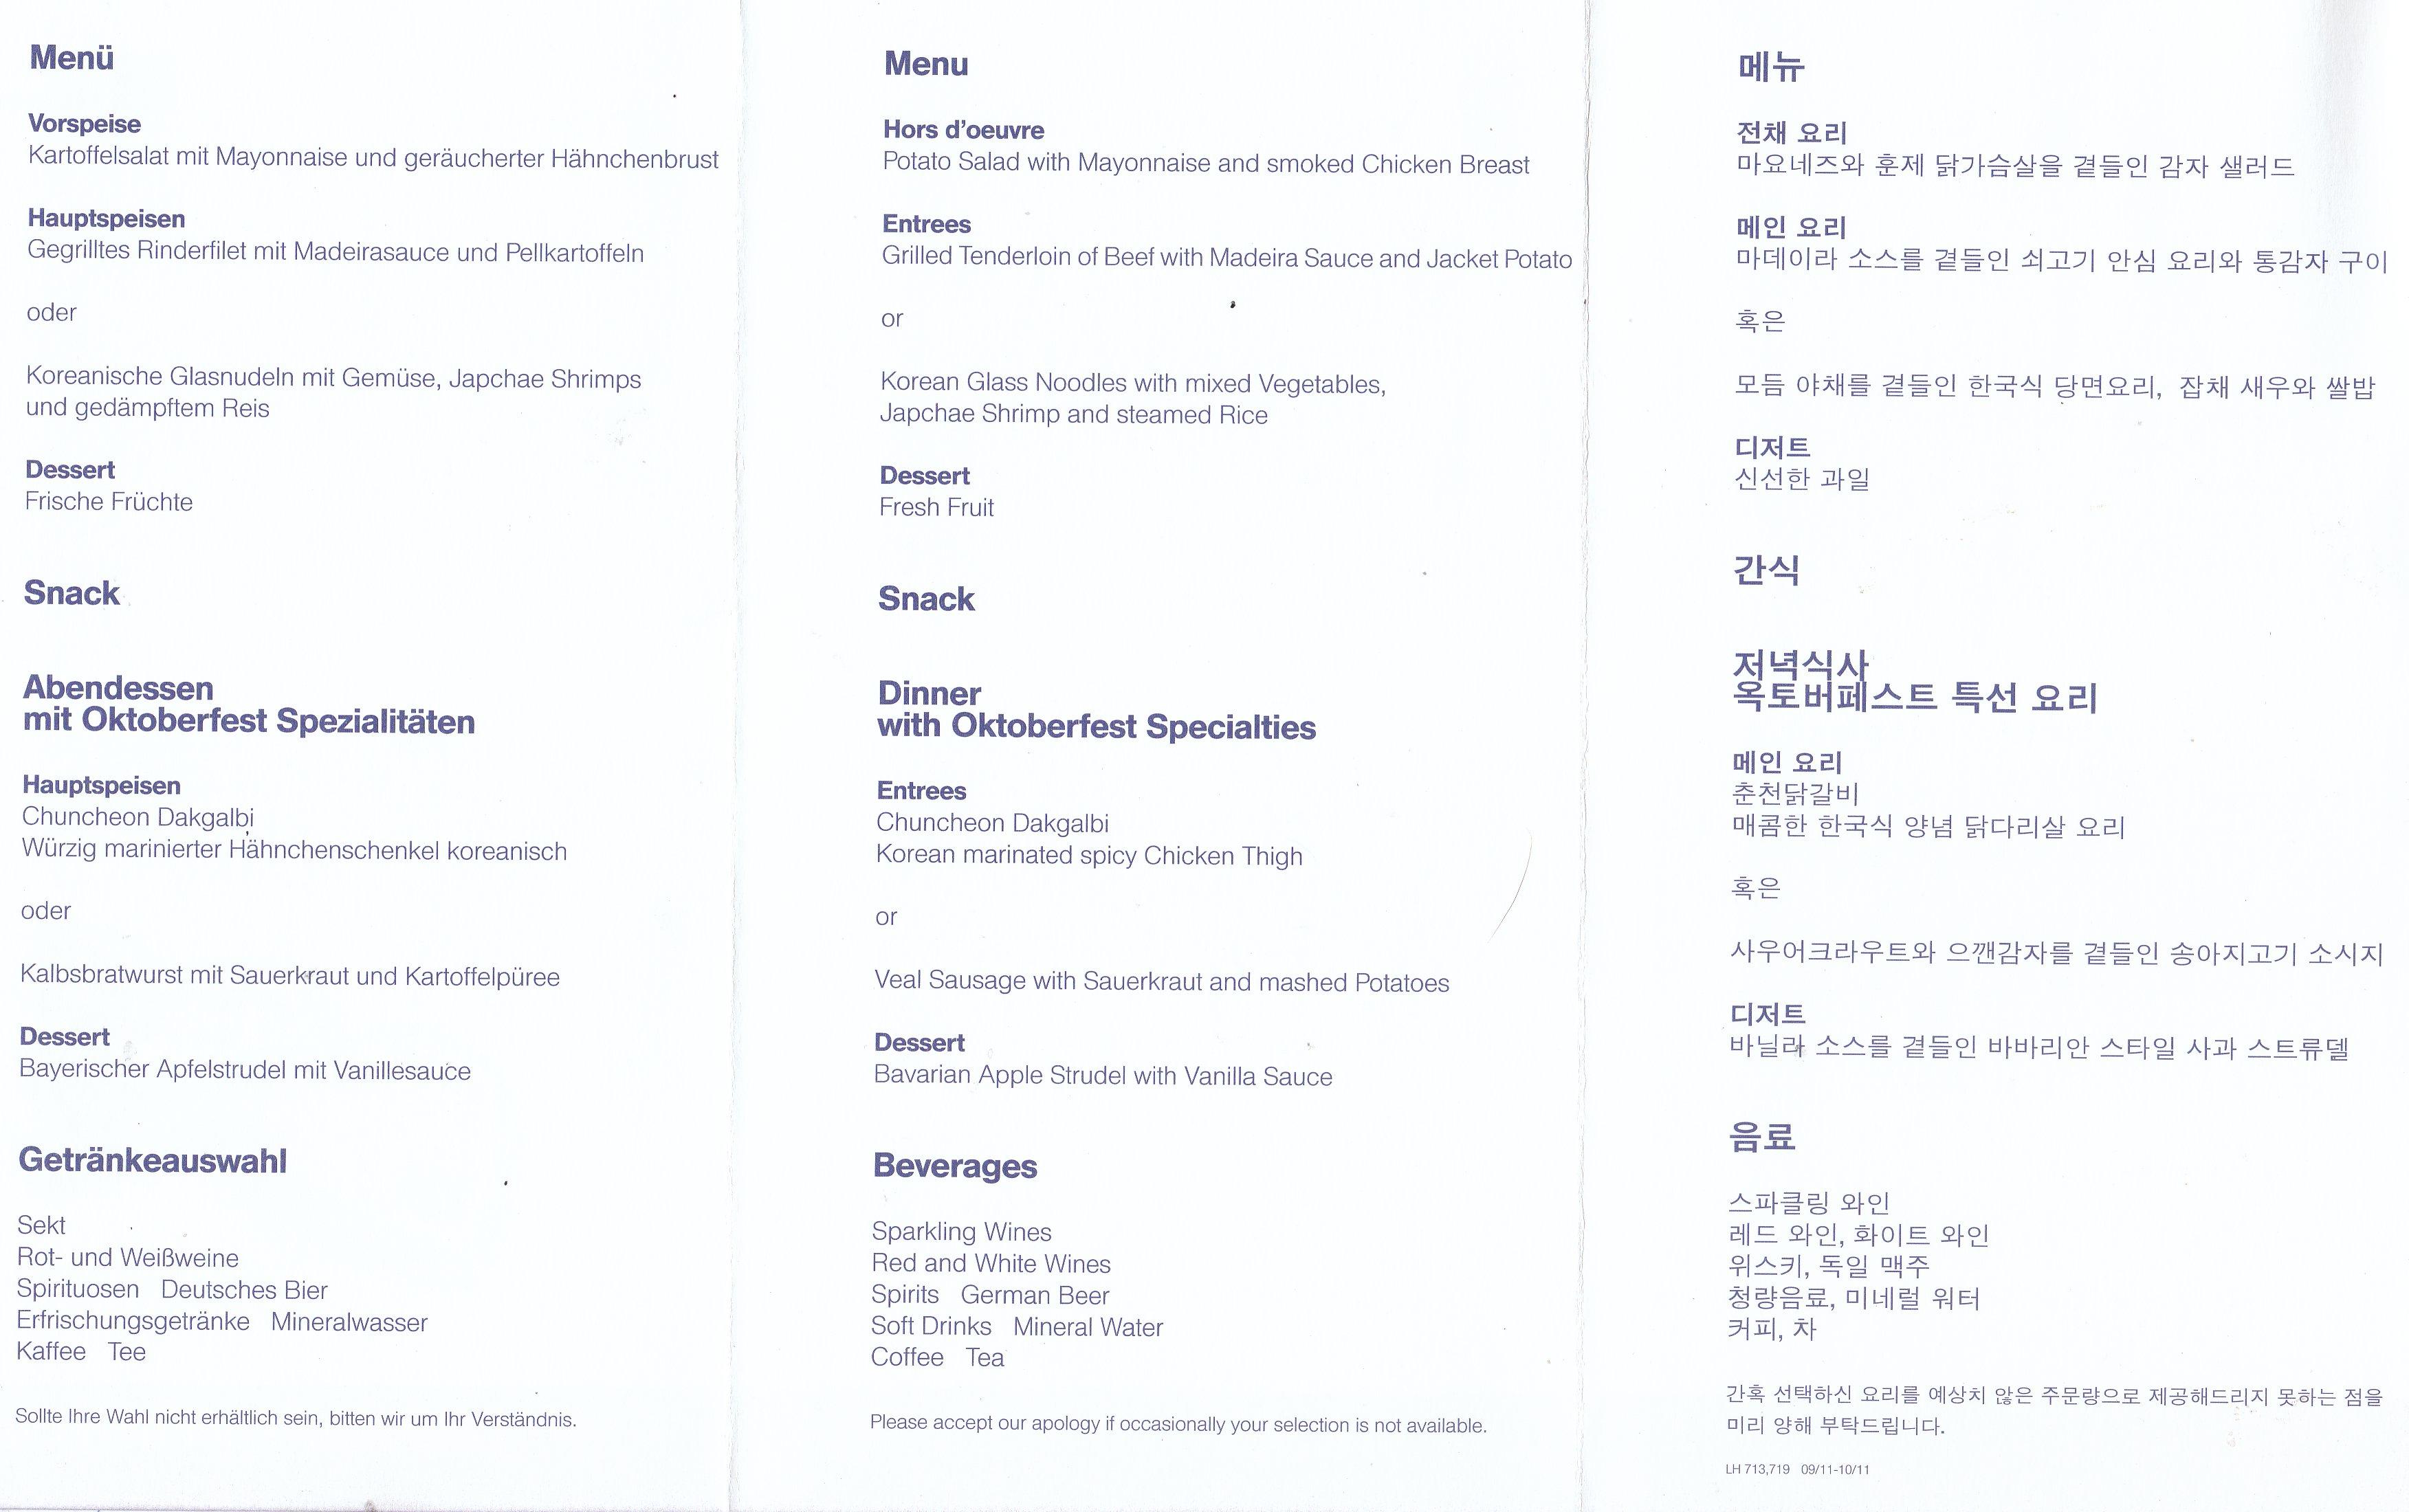 Menu coréen